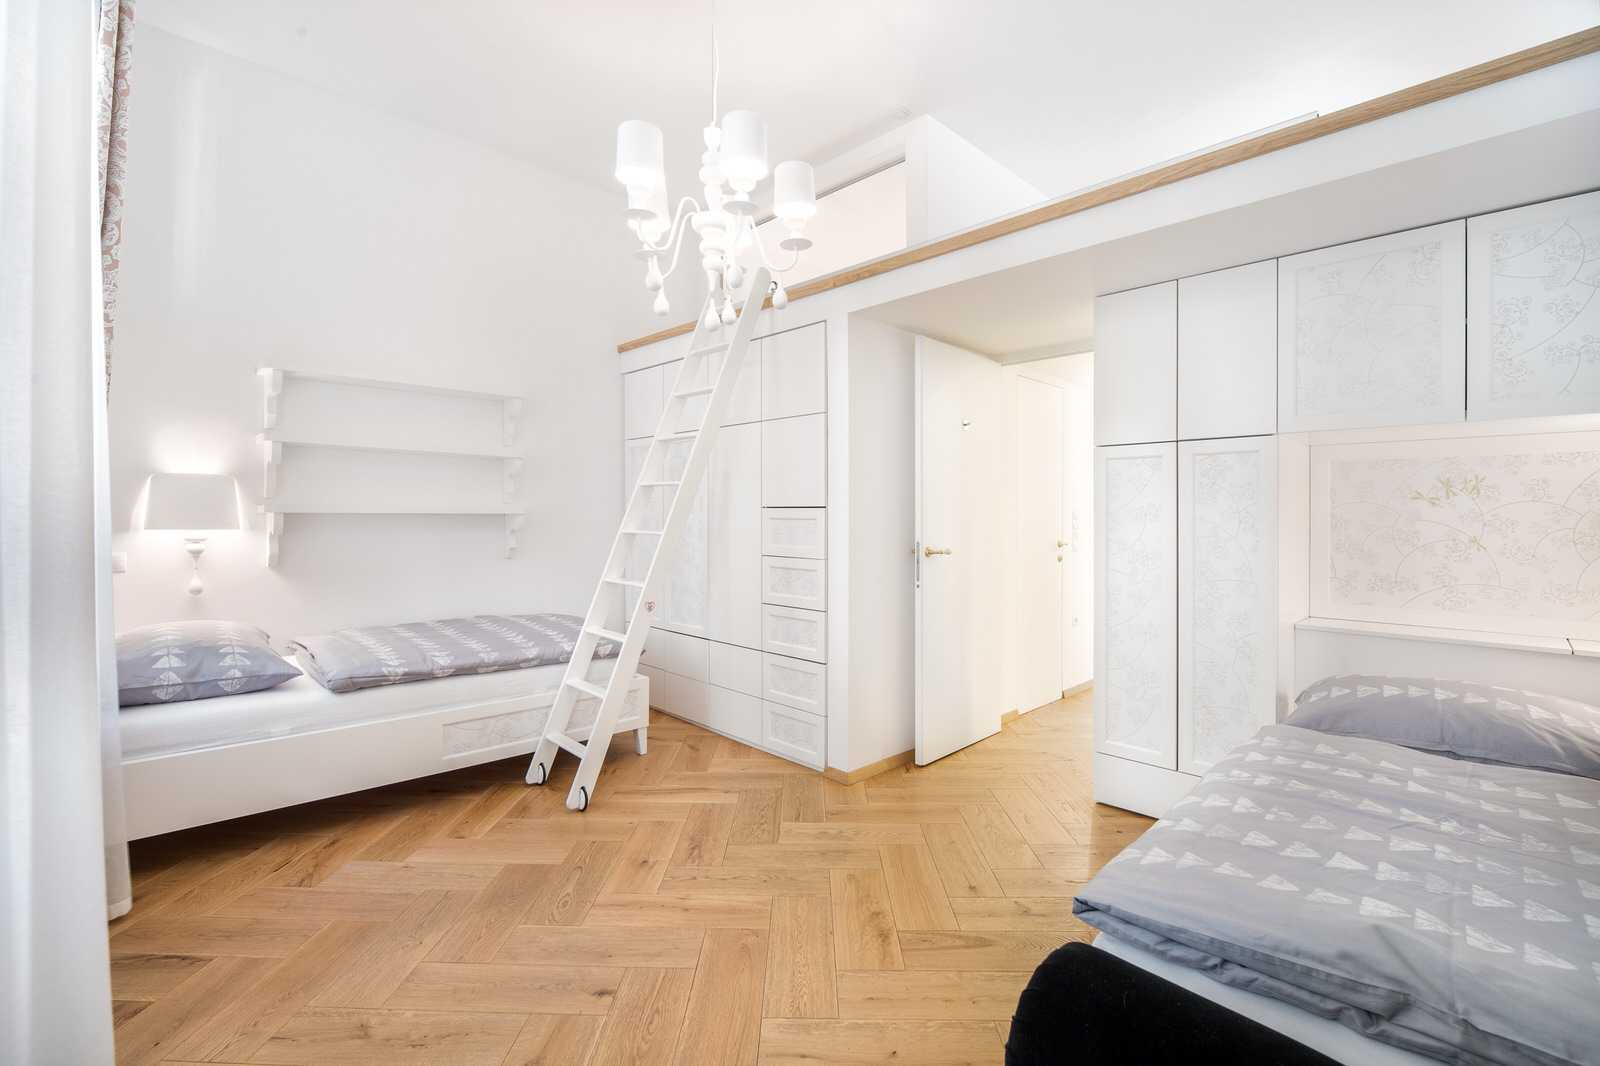 Ljubljana 2-bedroom Beethovnova apartment's twin bedroom with a gallery